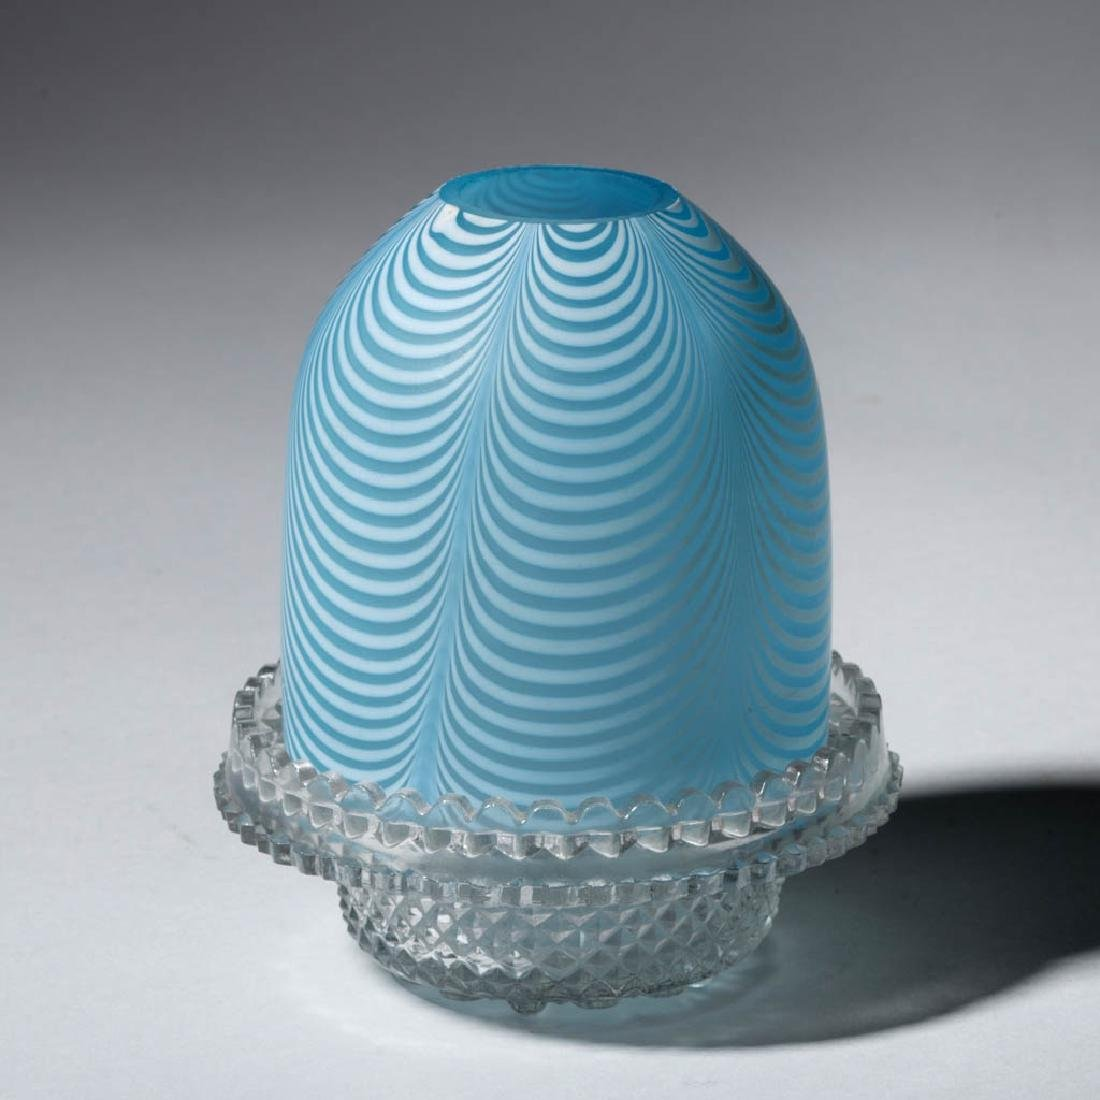 NAILSEA / VENETIAN THREAD FAIRY LAMP